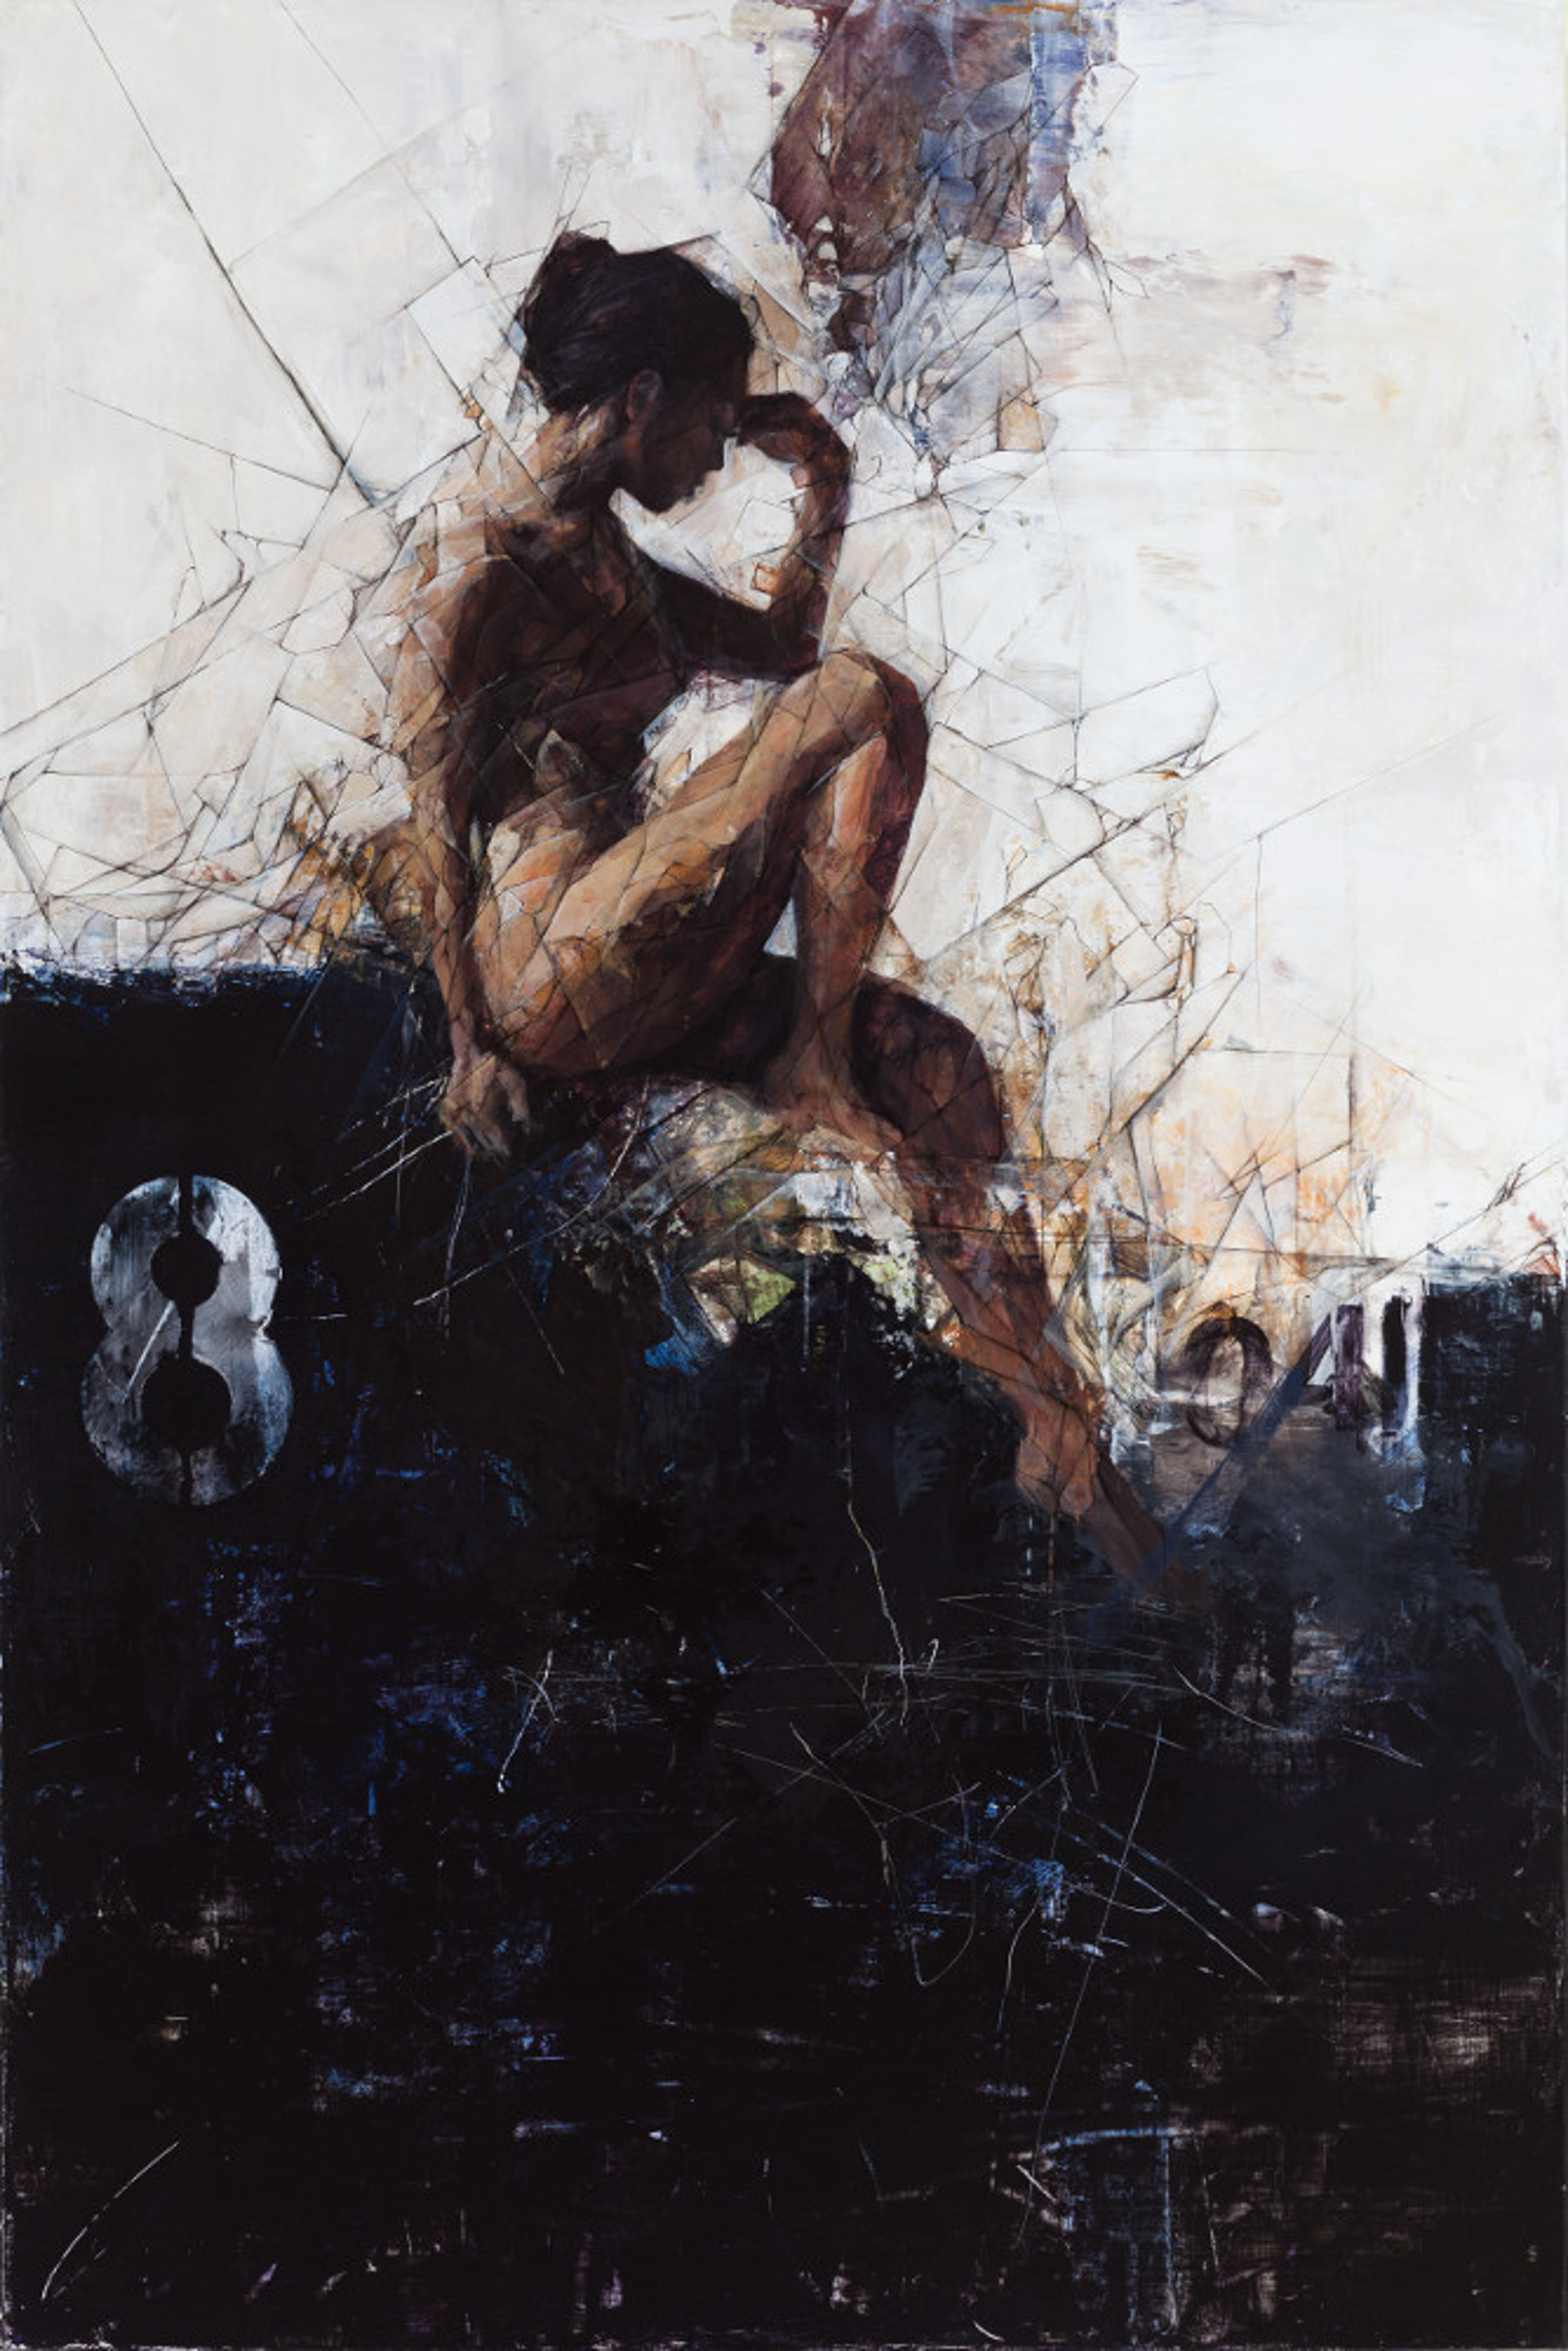 Solace - *19 by Aiden Kringen